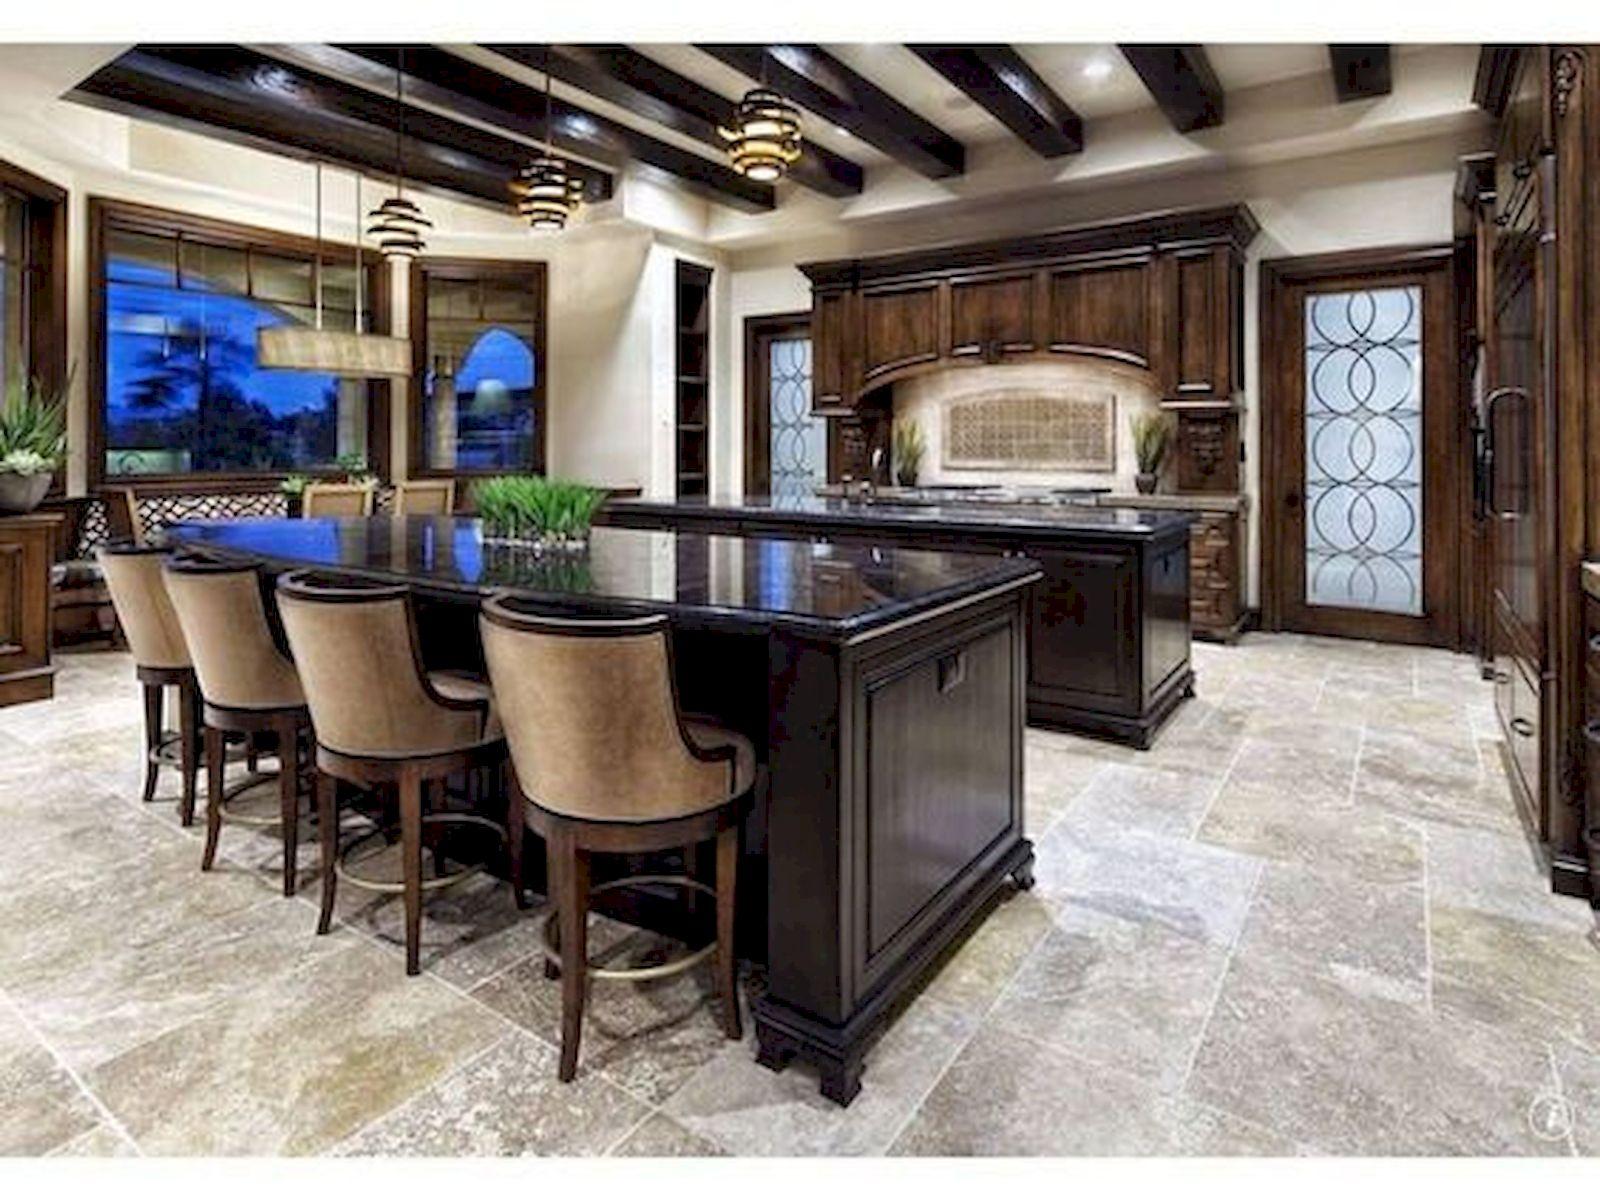 30 Best Kitchen Floor Tile Design Ideas With Concrete Floor Ideas (20)